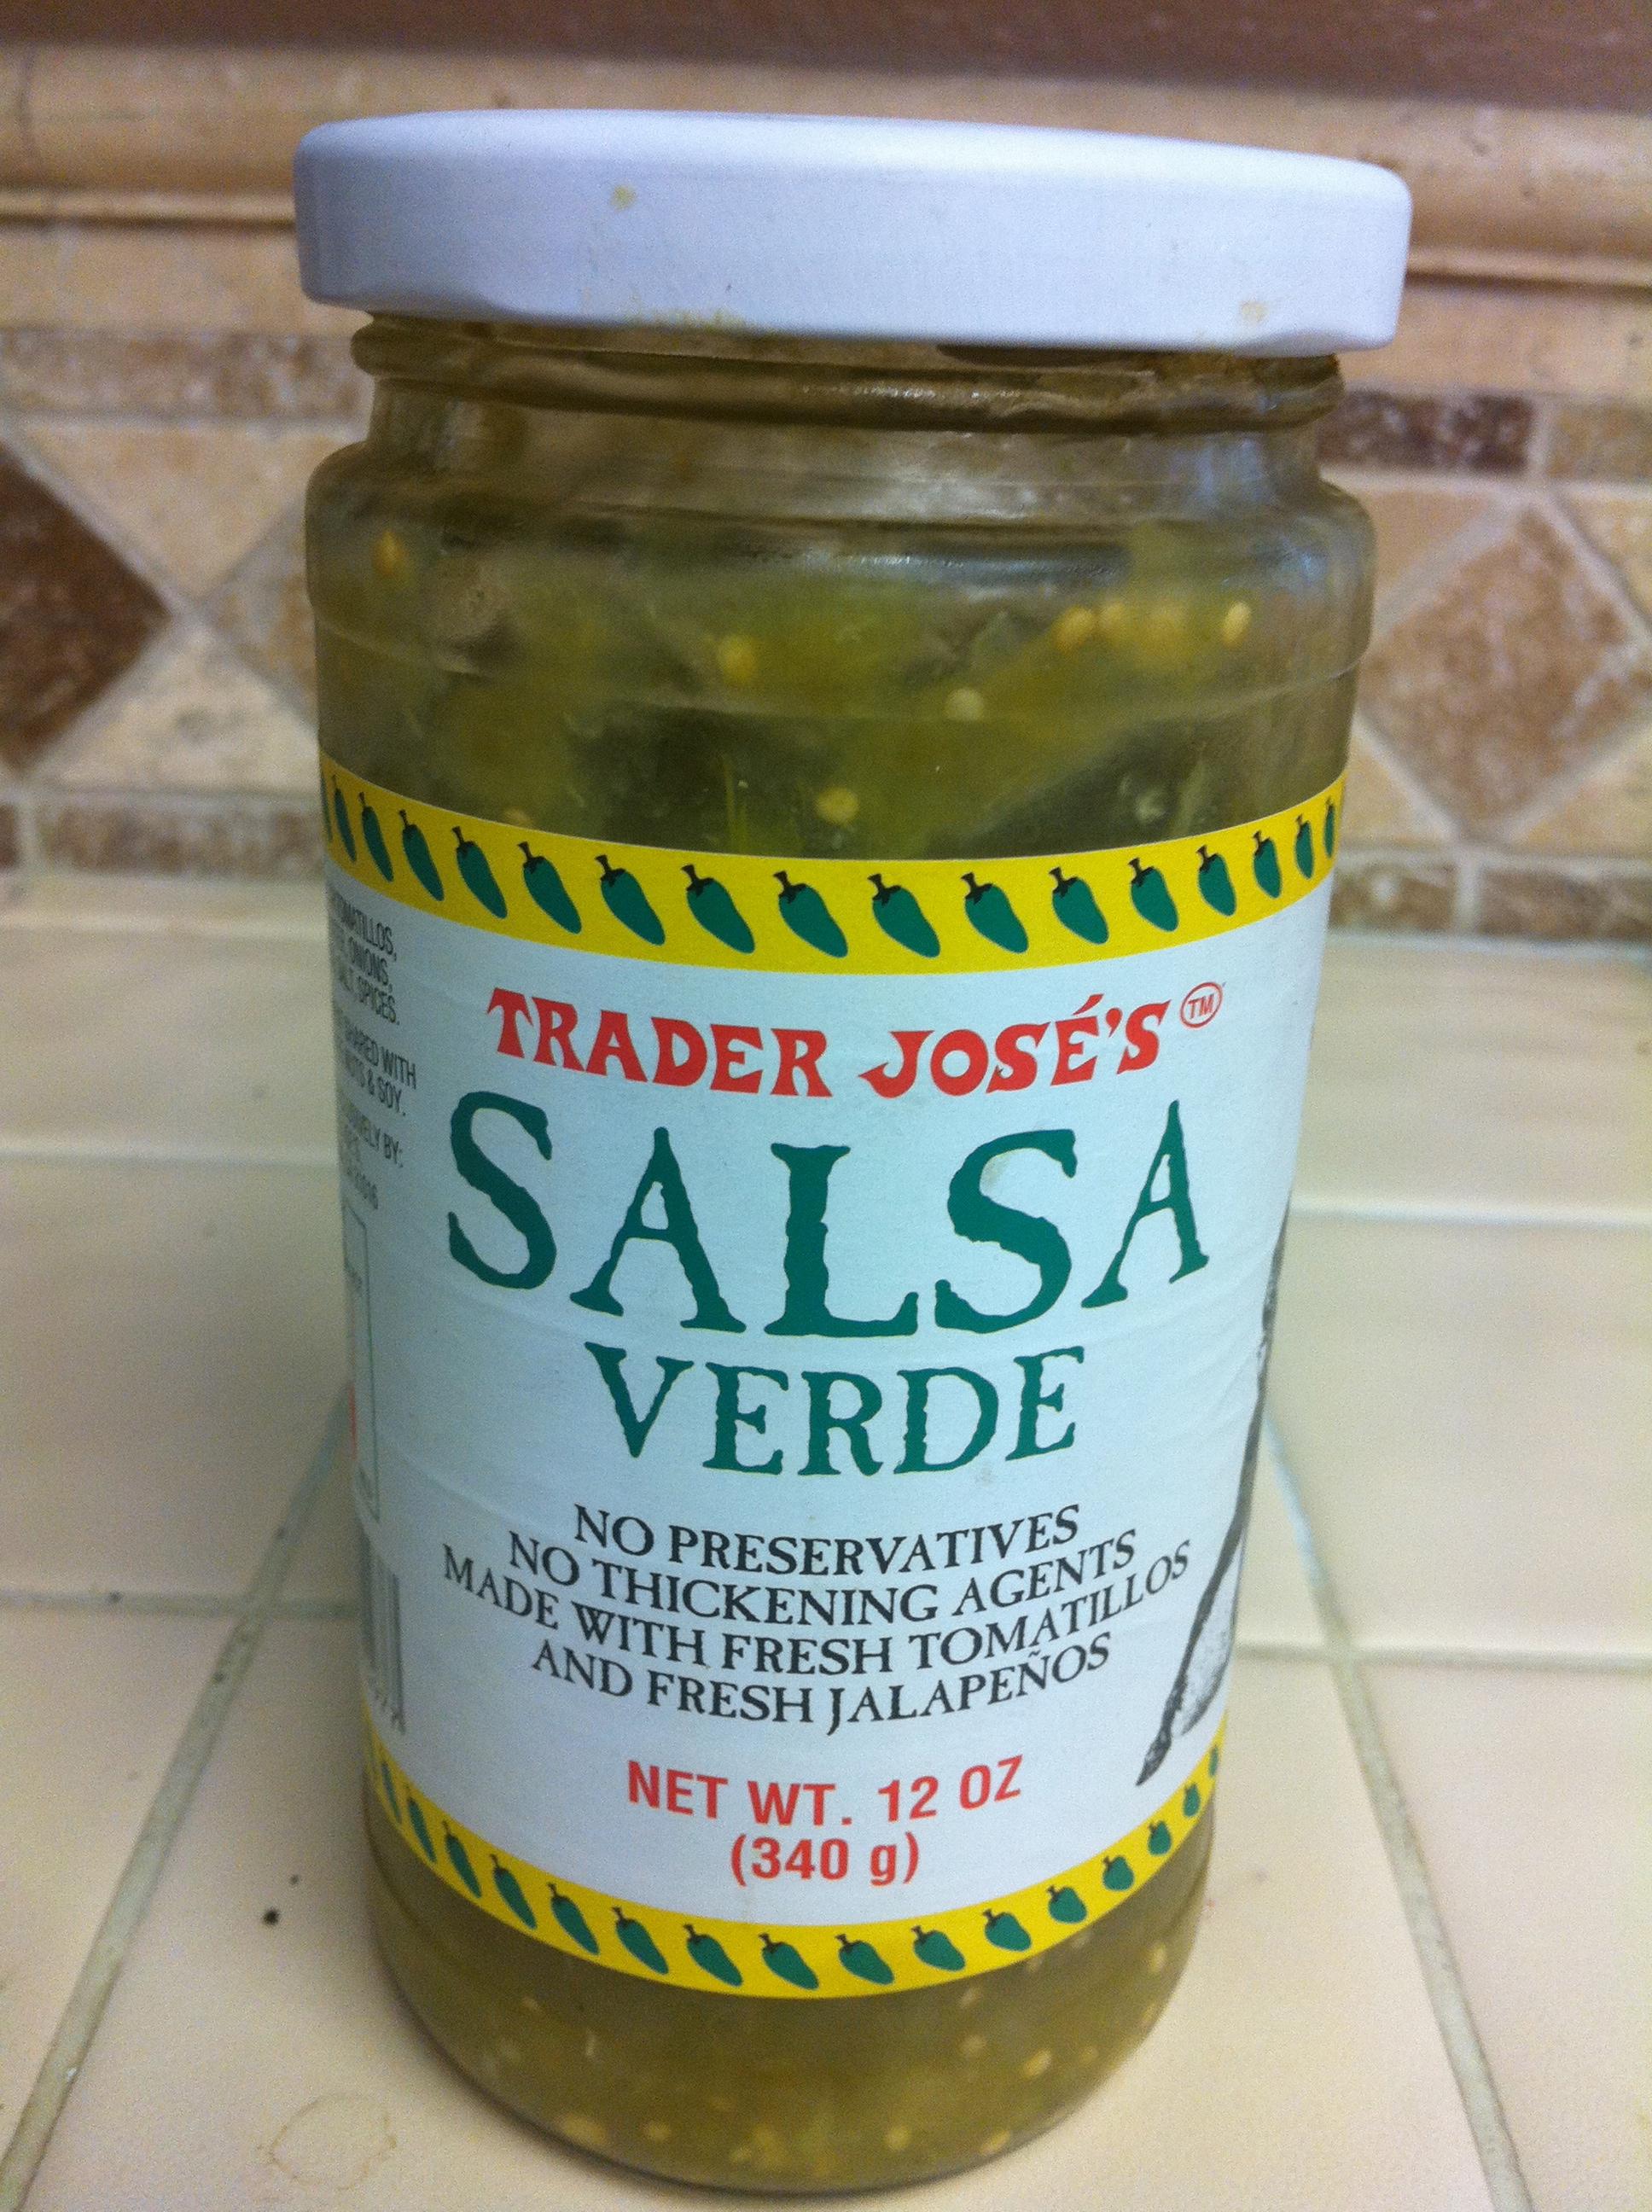 Trader jose 39 s salsa verde for Trader joe s fish oil